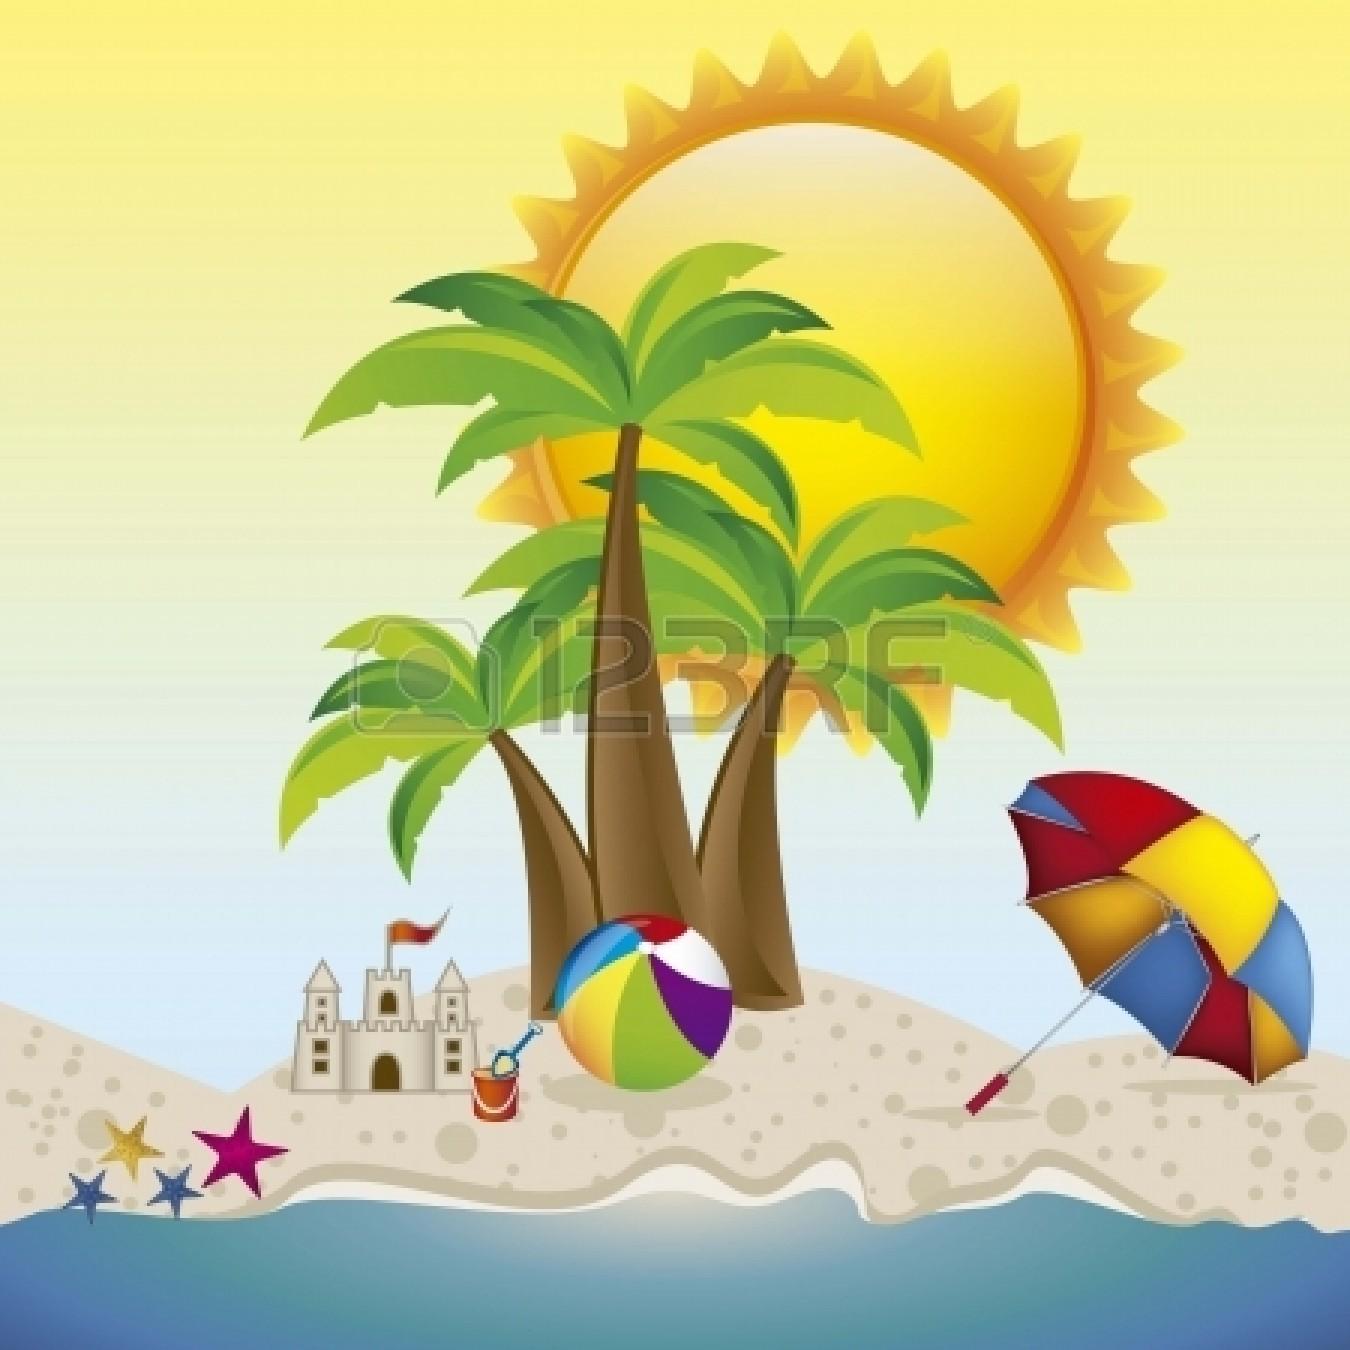 Summer Background Clipart.